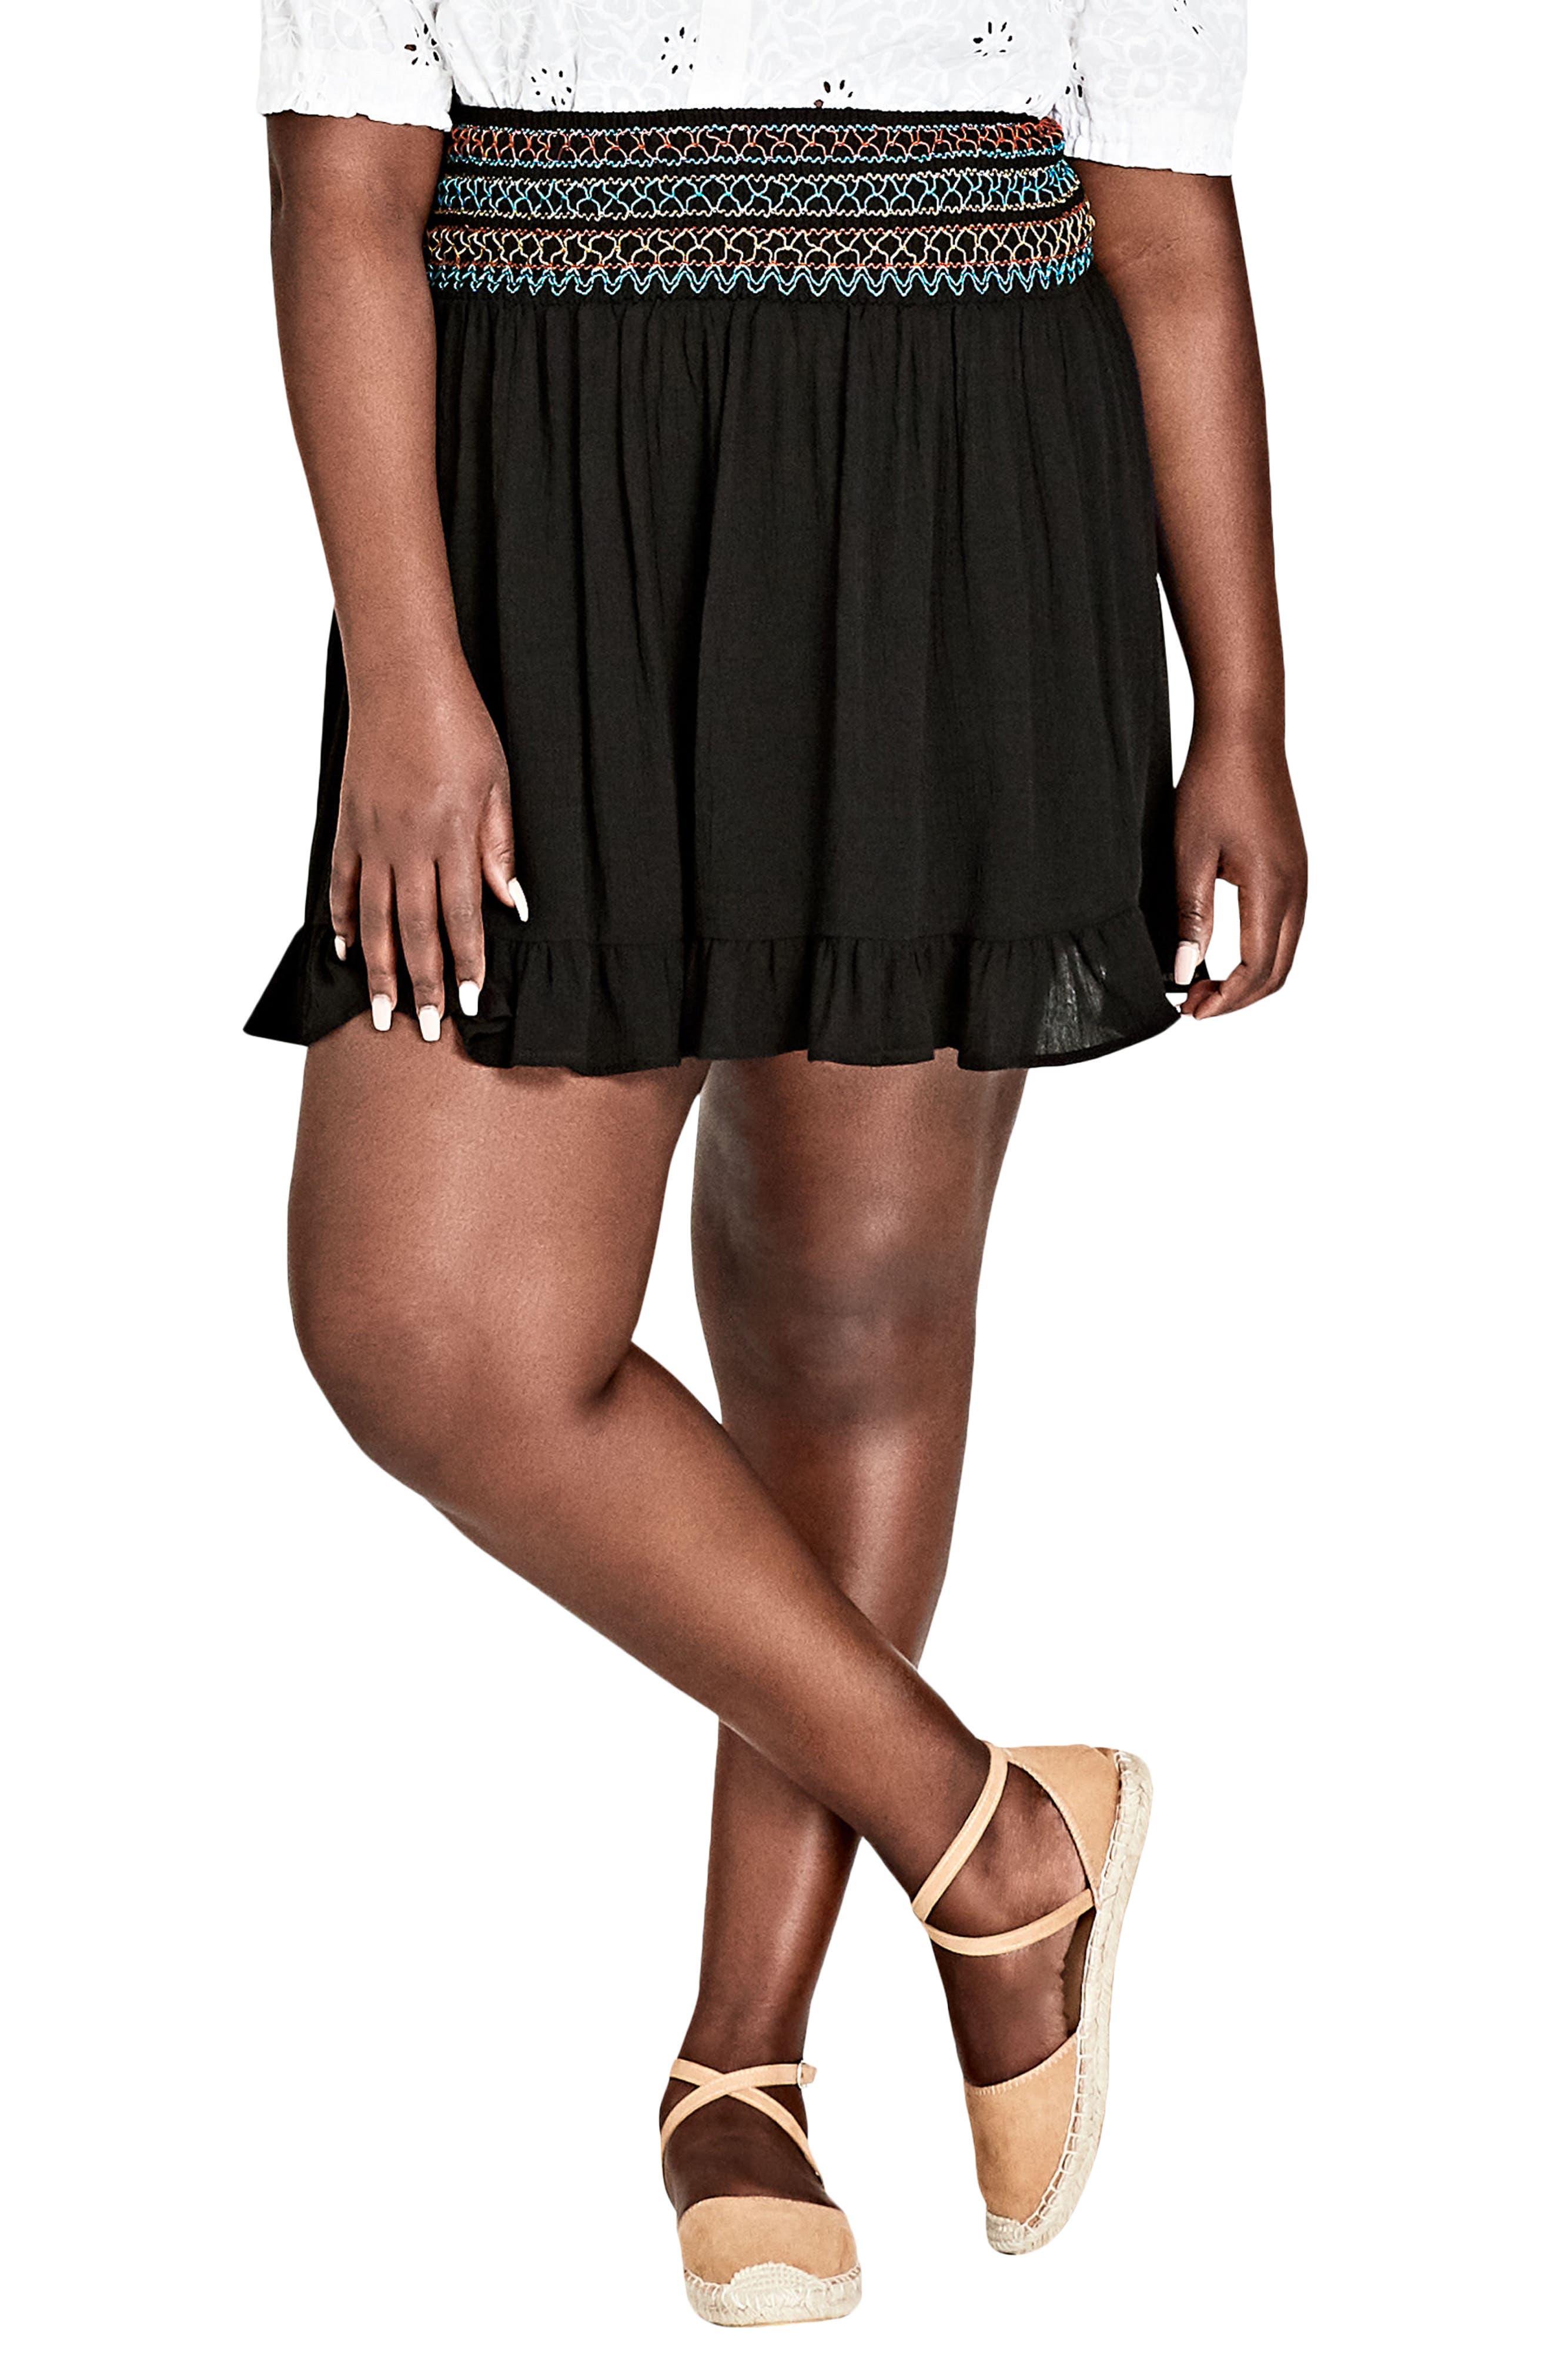 CITY CHIC Makana Skirt, Main, color, 001